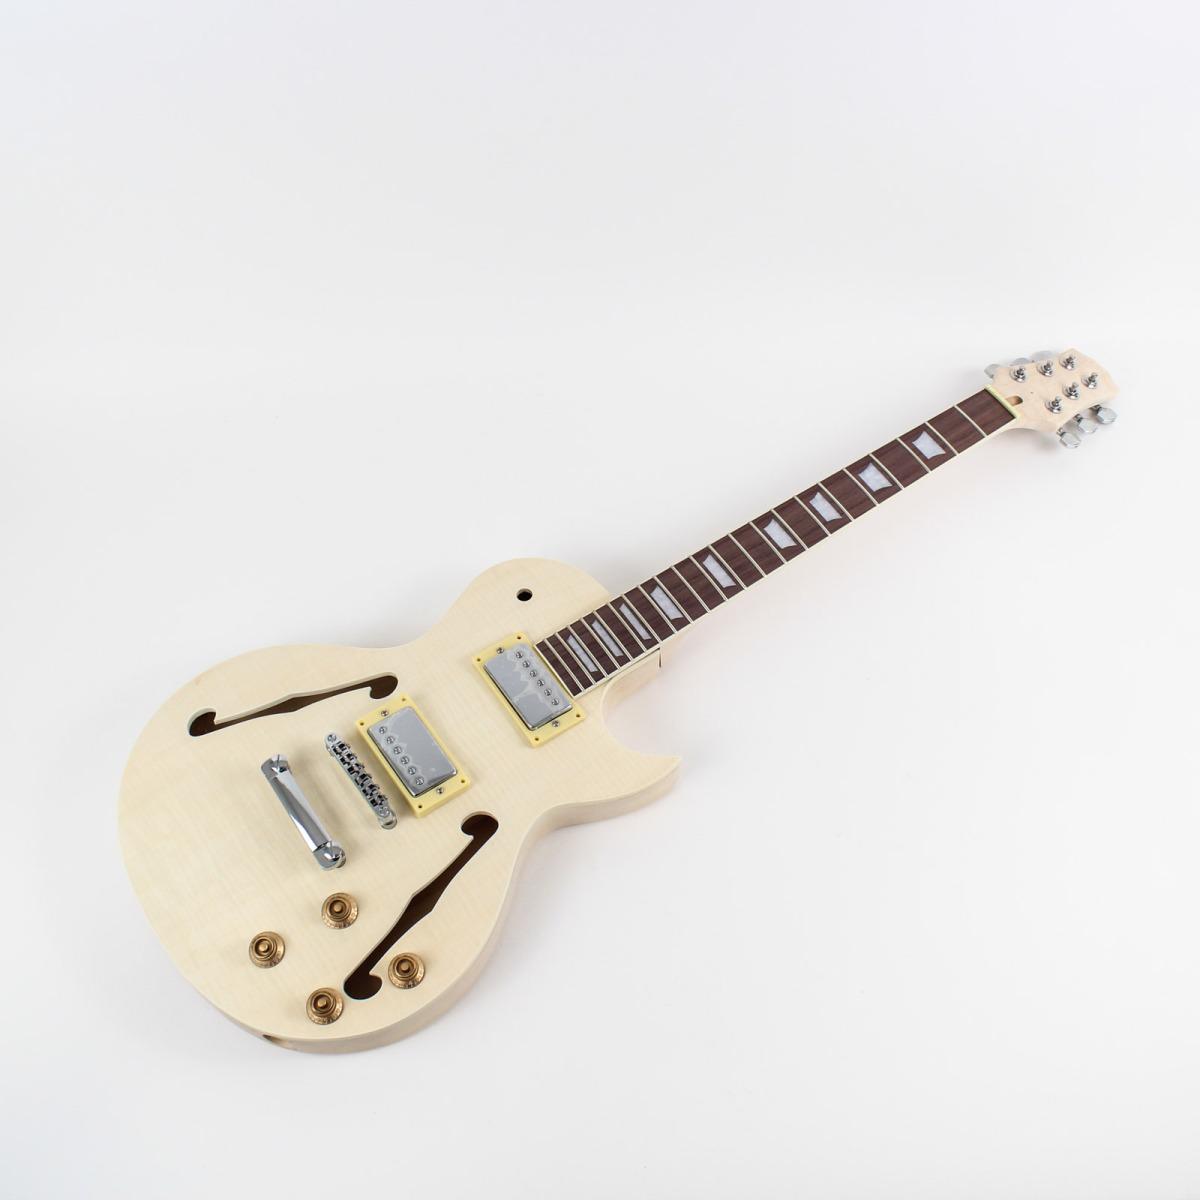 gibson les paul custom semi hollow 1989 toyota pickup fuse box diagram body diy guitar kit guitars